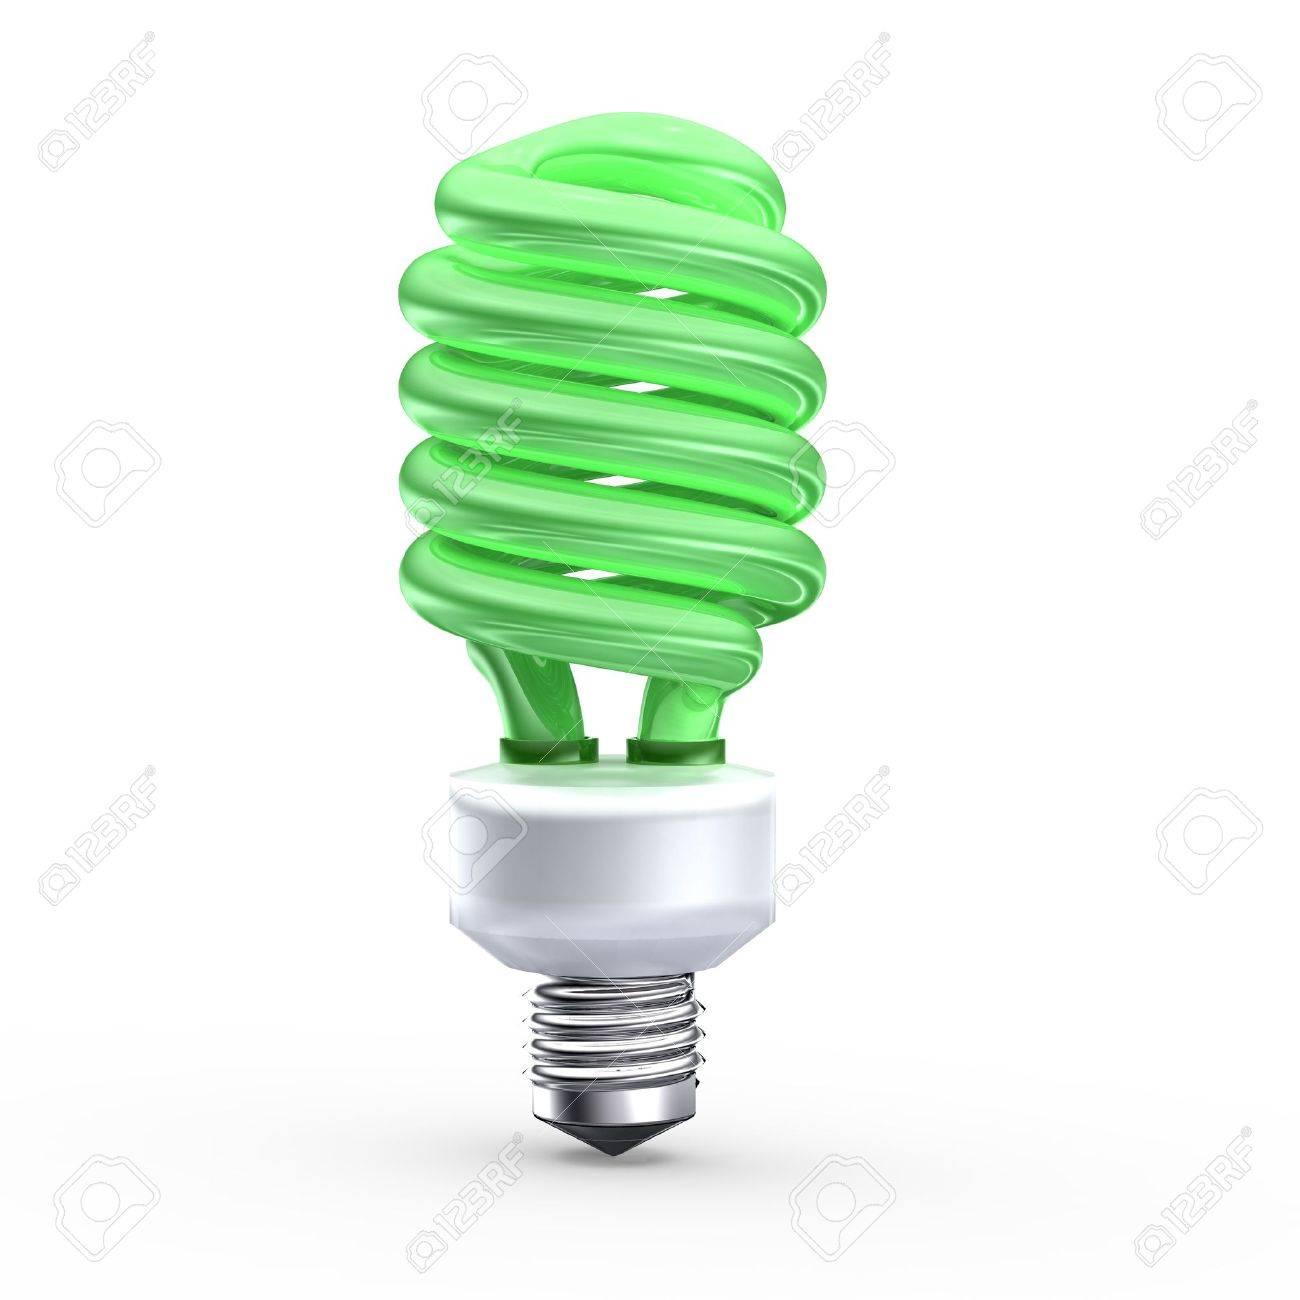 Fluorescent saving light bulb on green background Stock Photo - 8255087